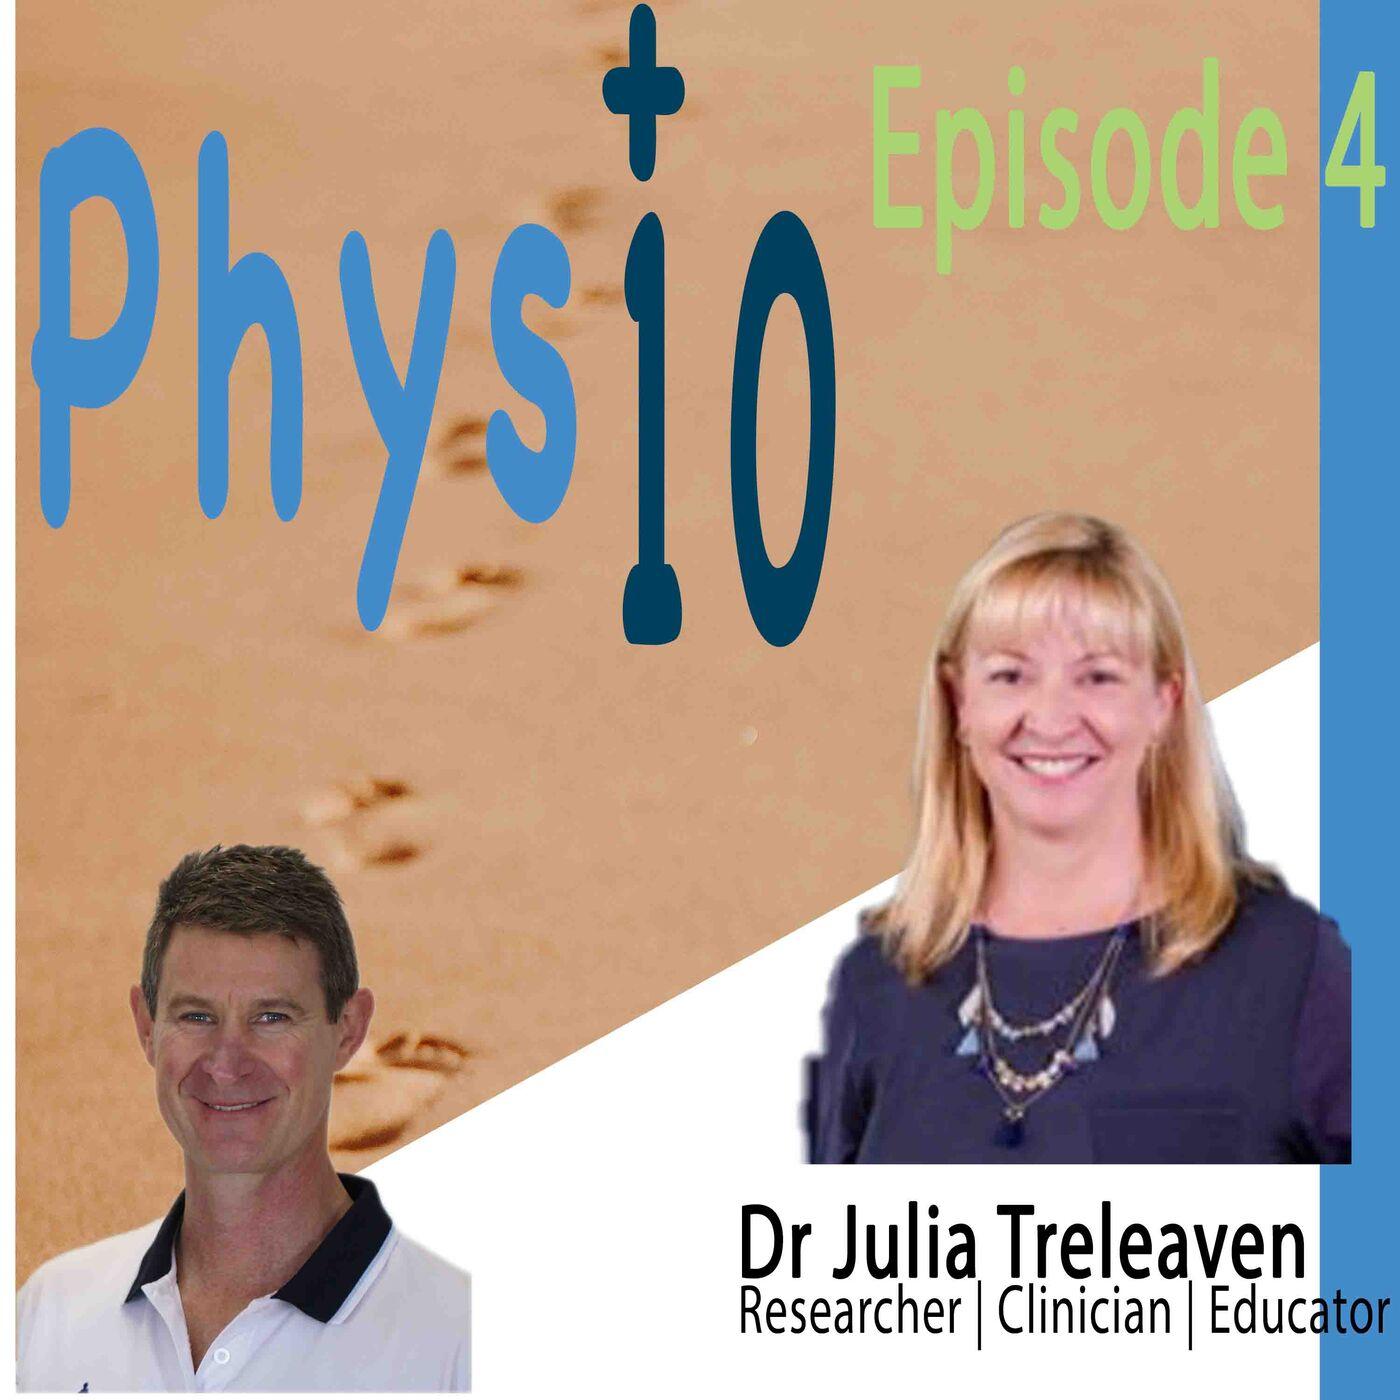 Dr Julia Treleaven:  Researcher | Clinician | Educator